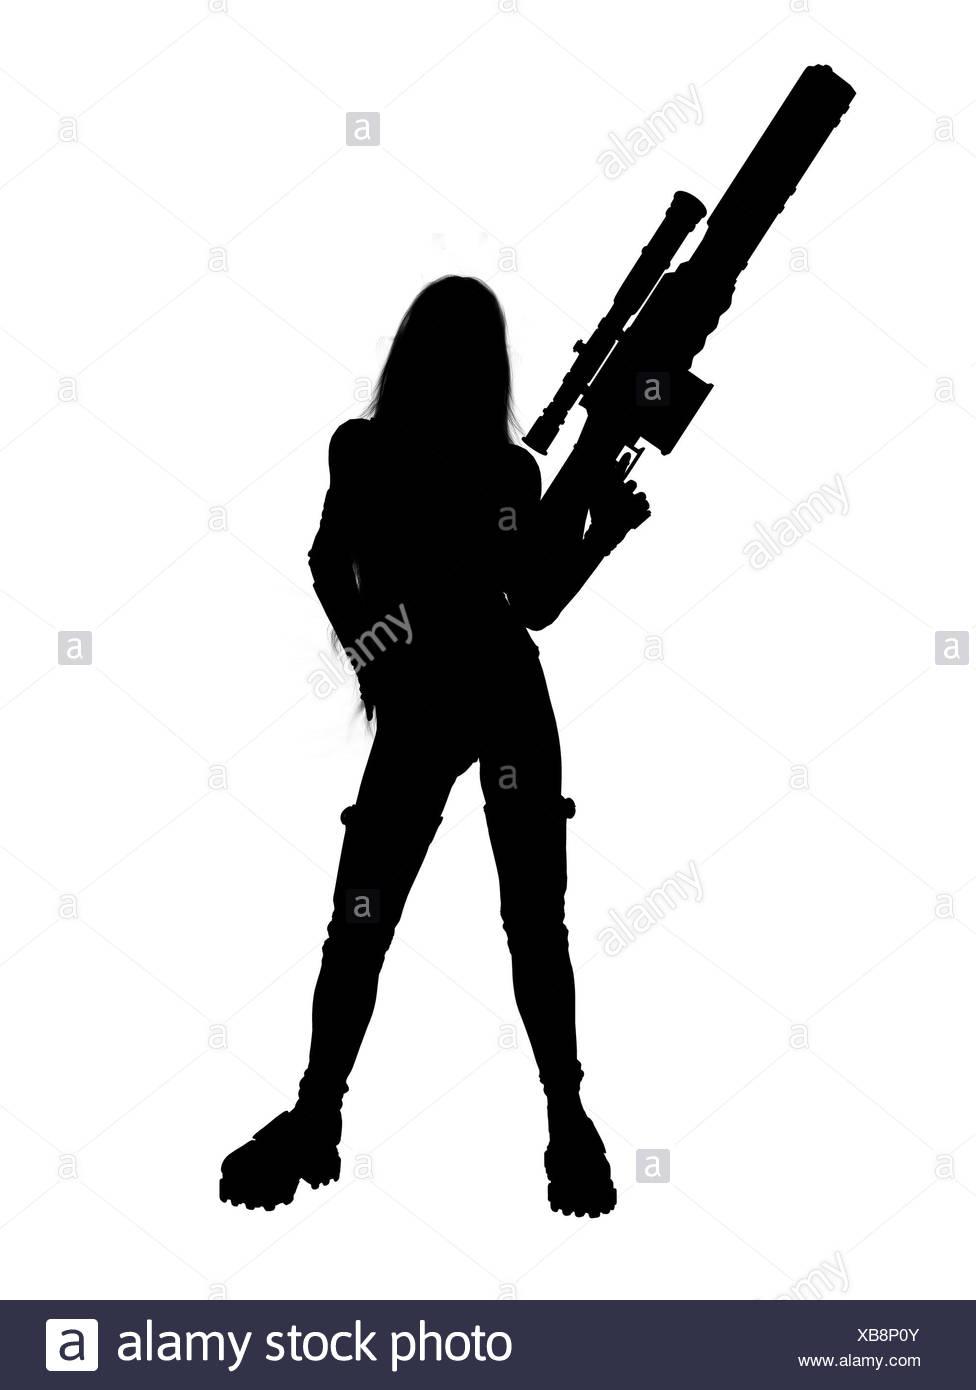 976x1390 Girl Gun Silhouette Stock Photos Amp Girl Gun Silhouette Stock